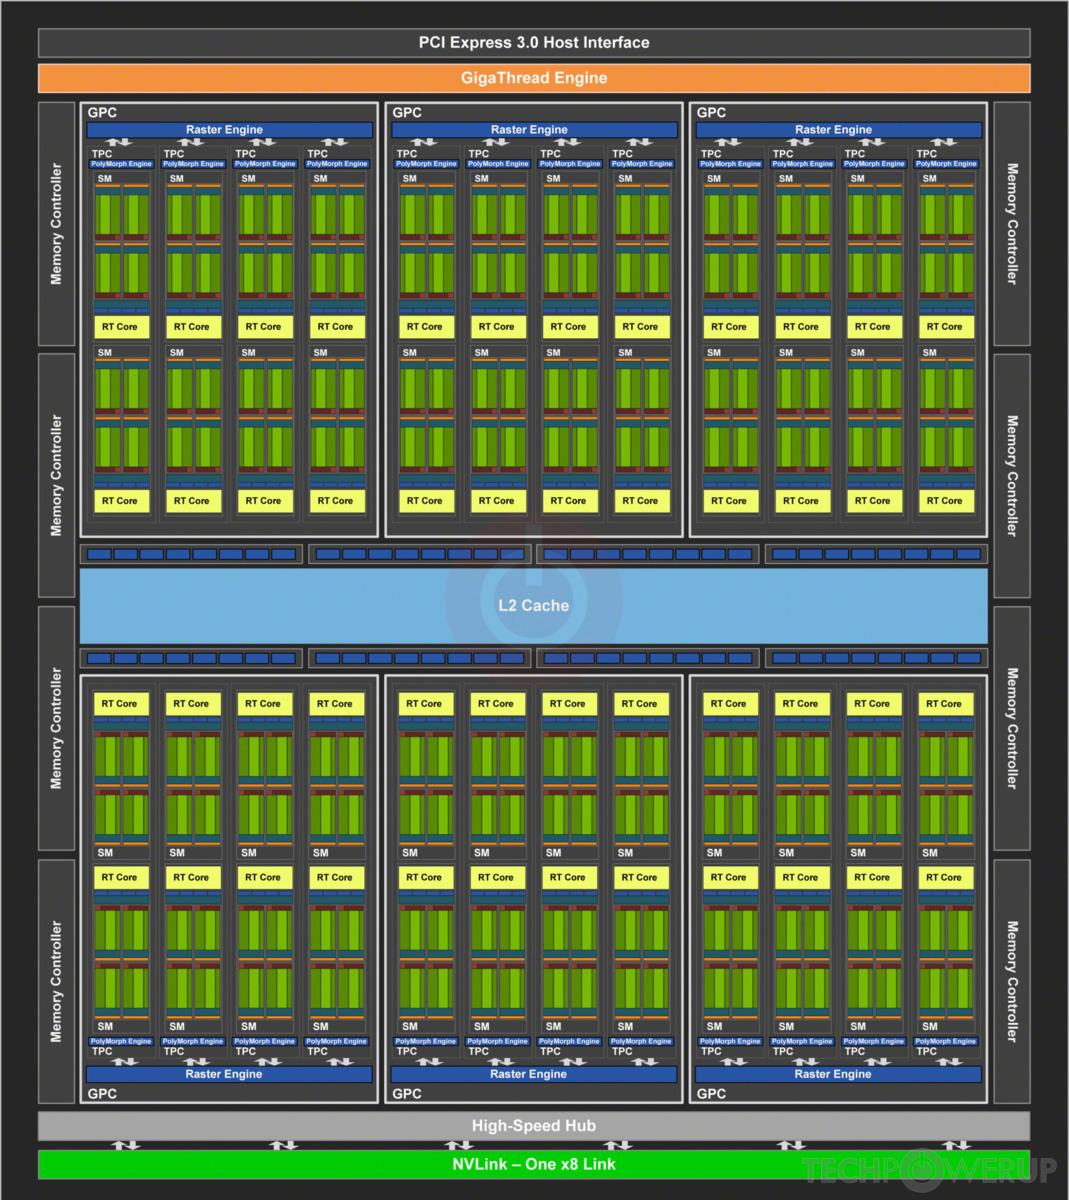 Nvidia Tu104 Gpu Specs